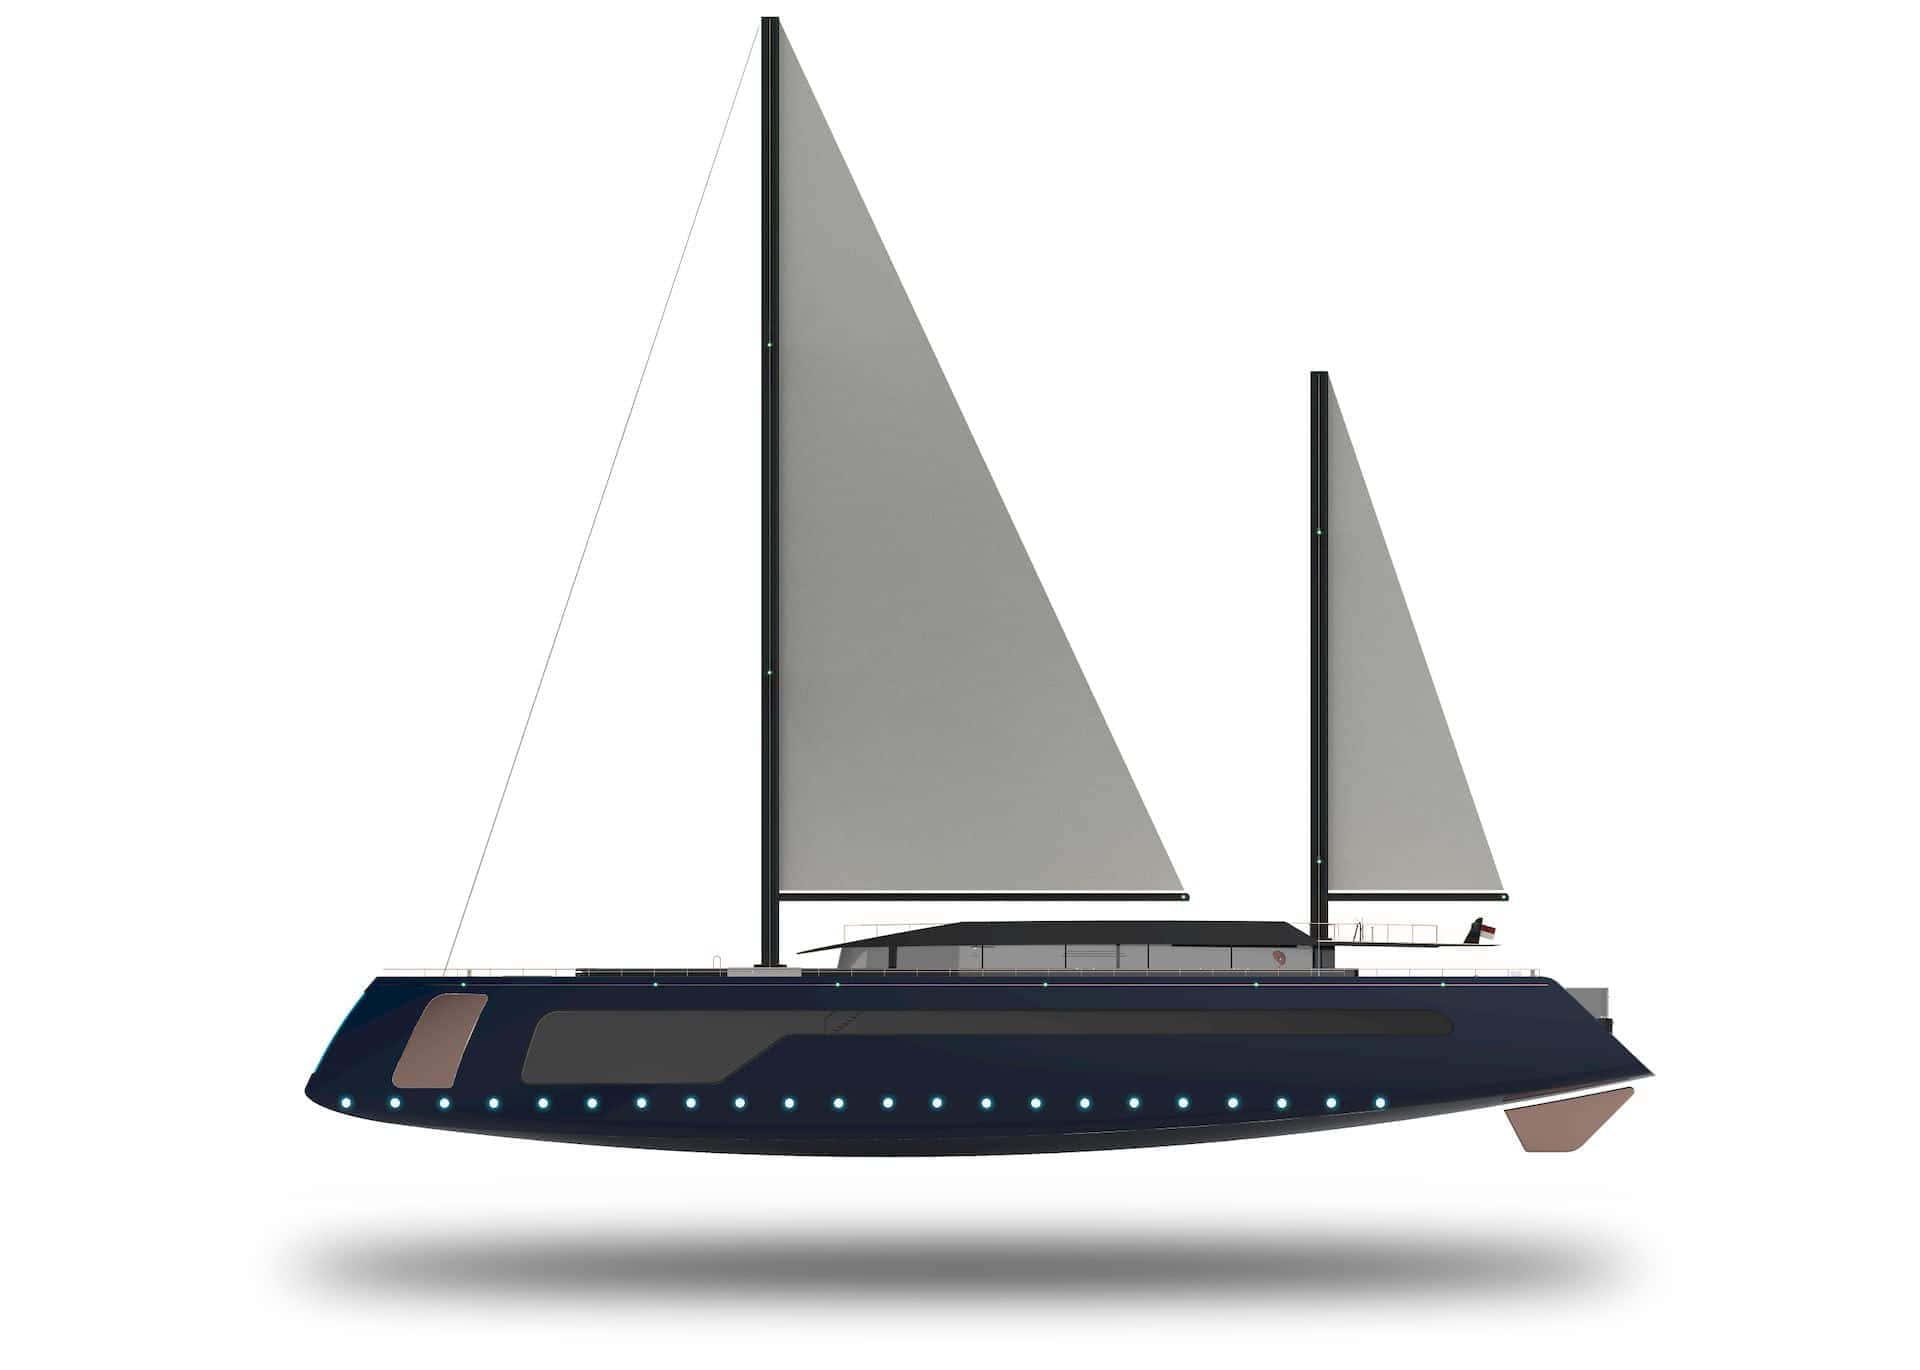 Longitudinalis Julien Cadro Sailing Yacht Concept